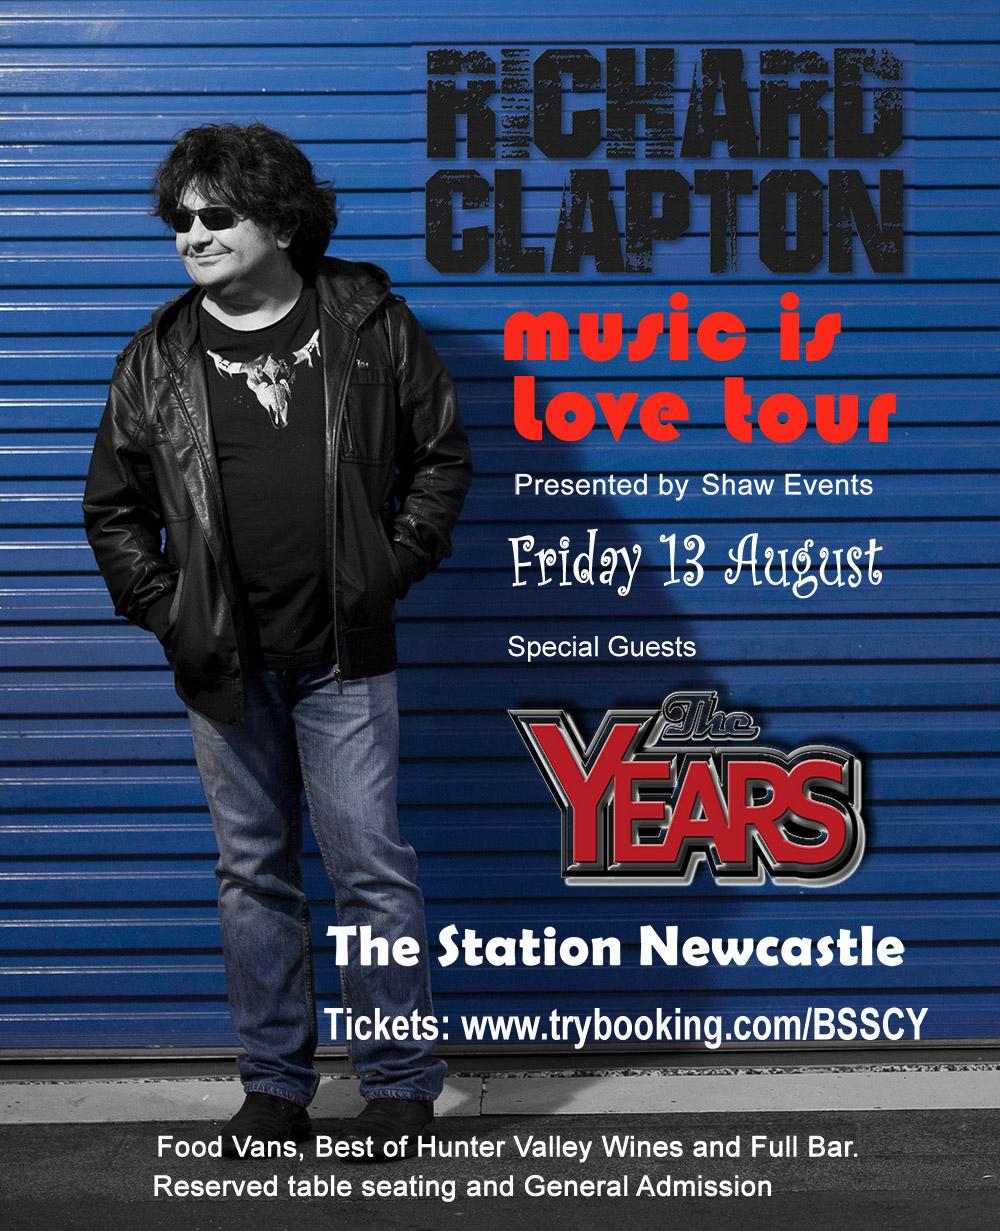 RICHARD CLAPTON music is love tour